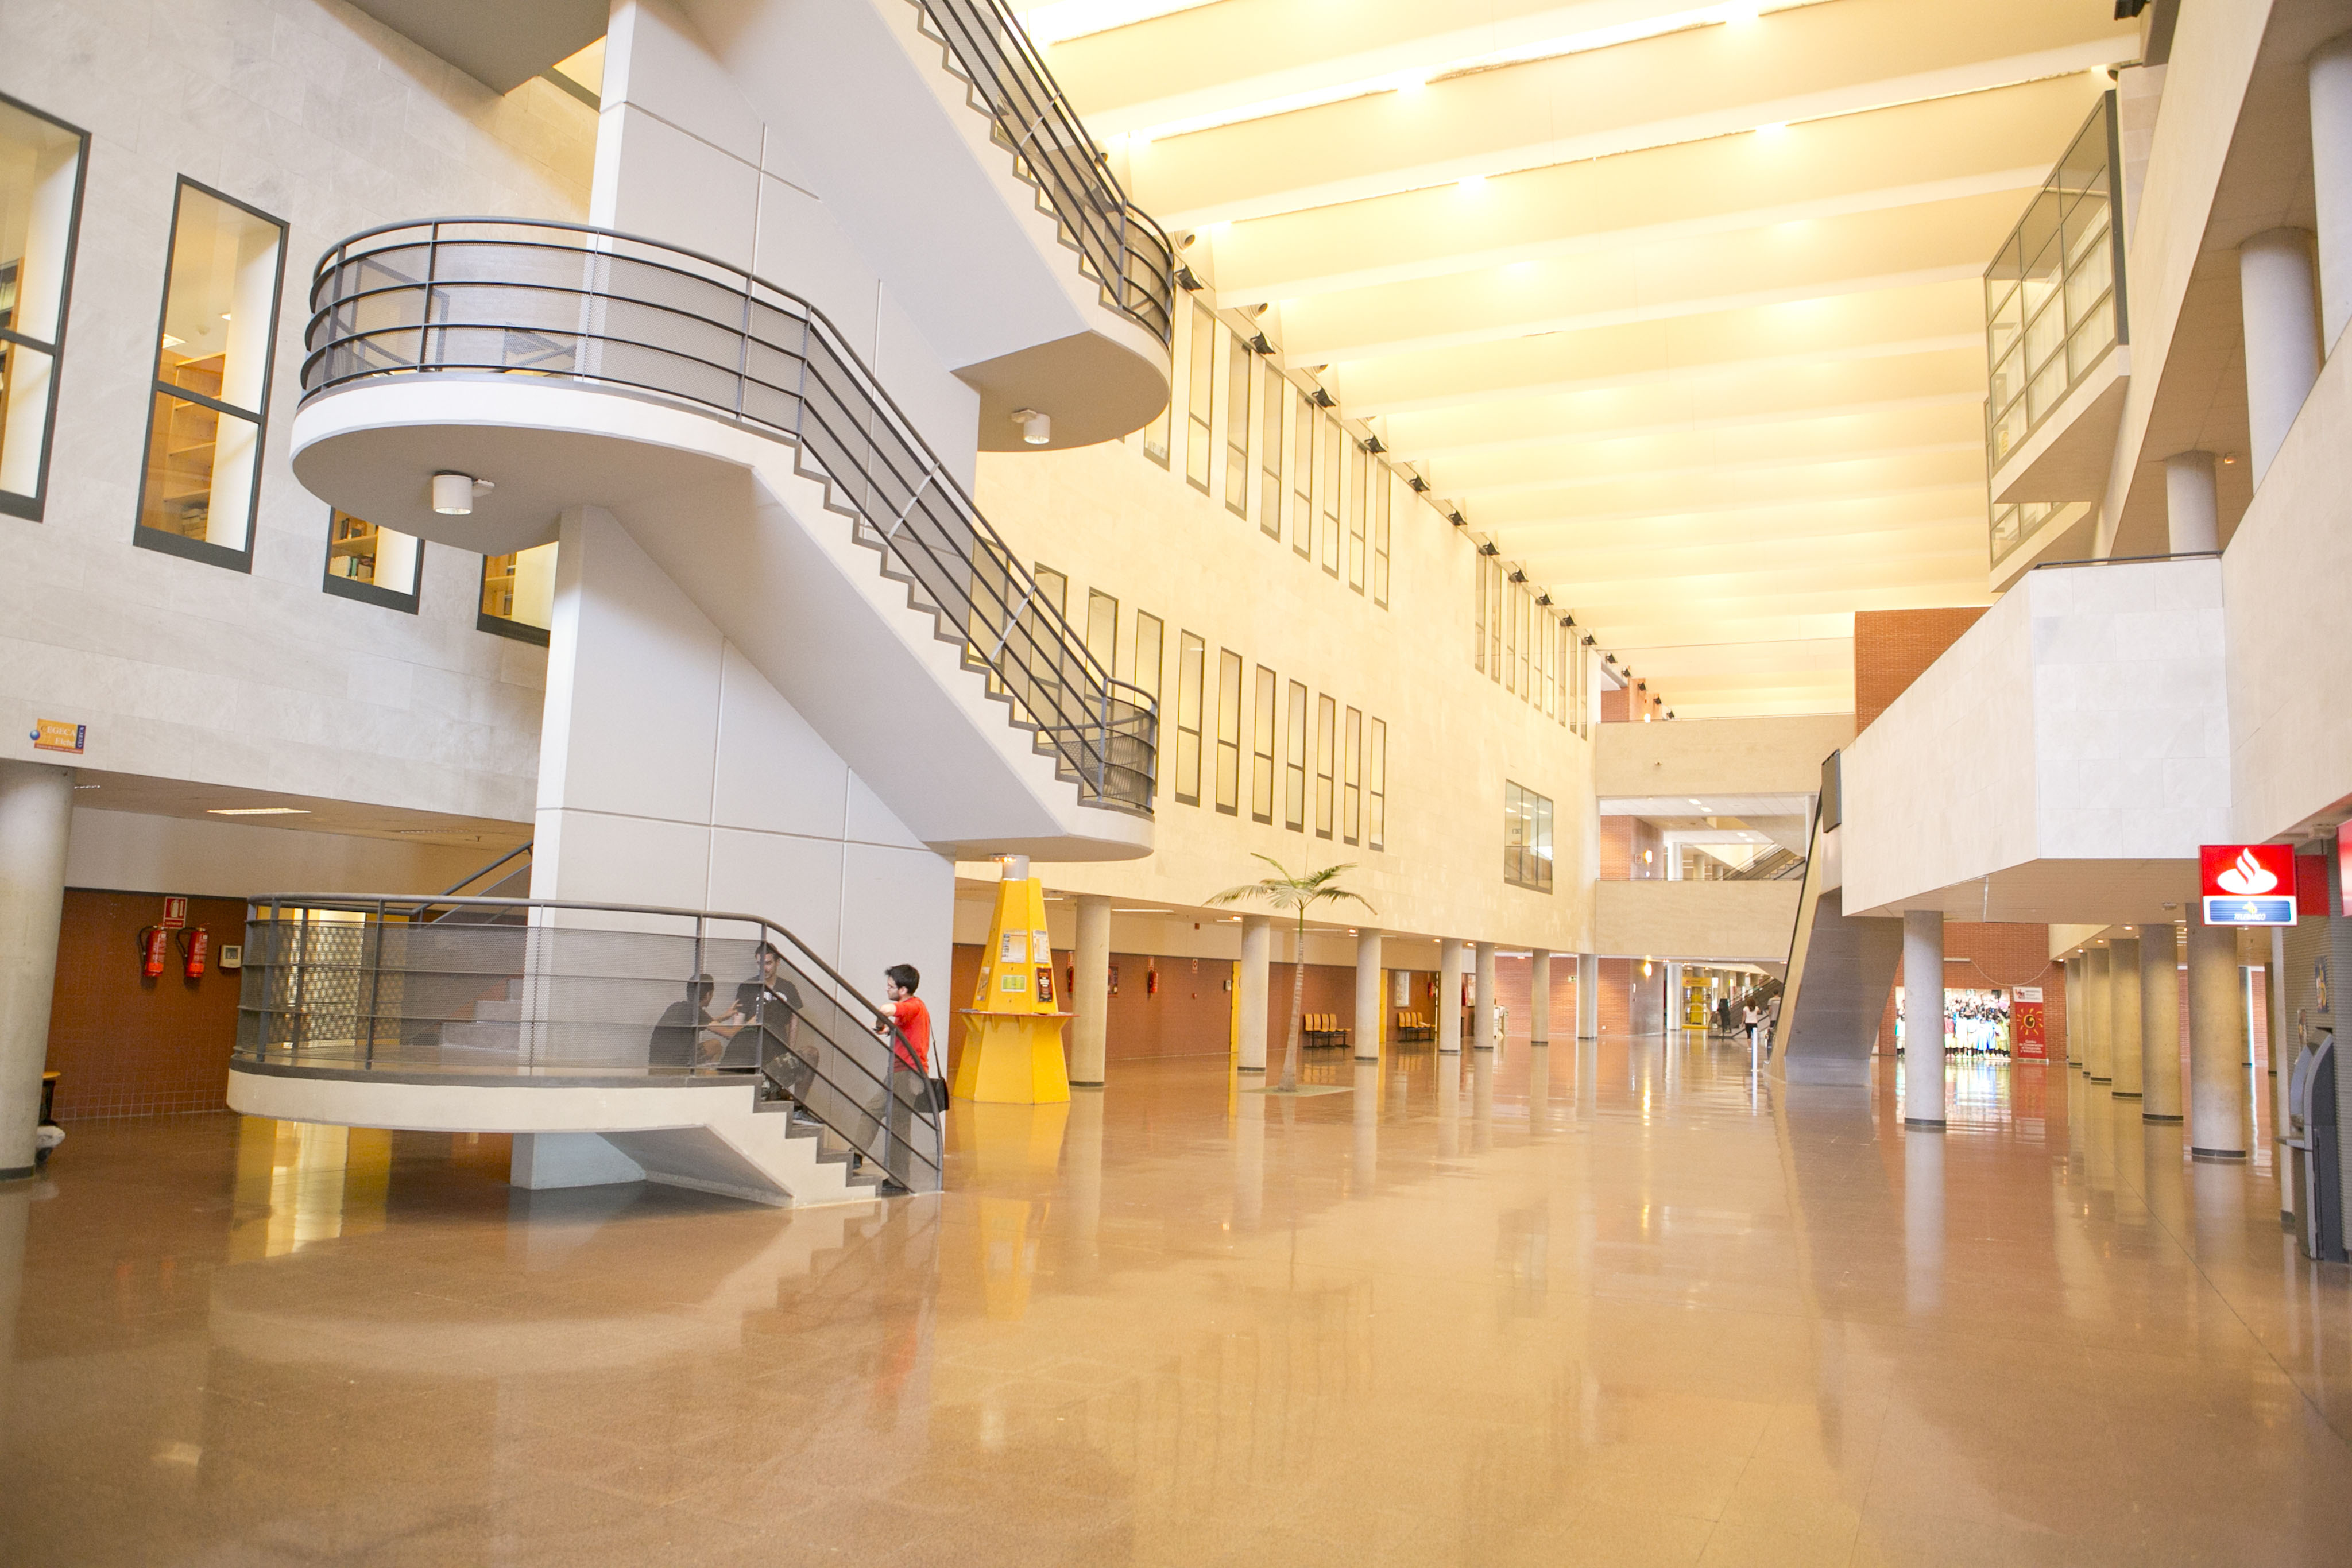 Campus-Elche-exteriores_K8B2583